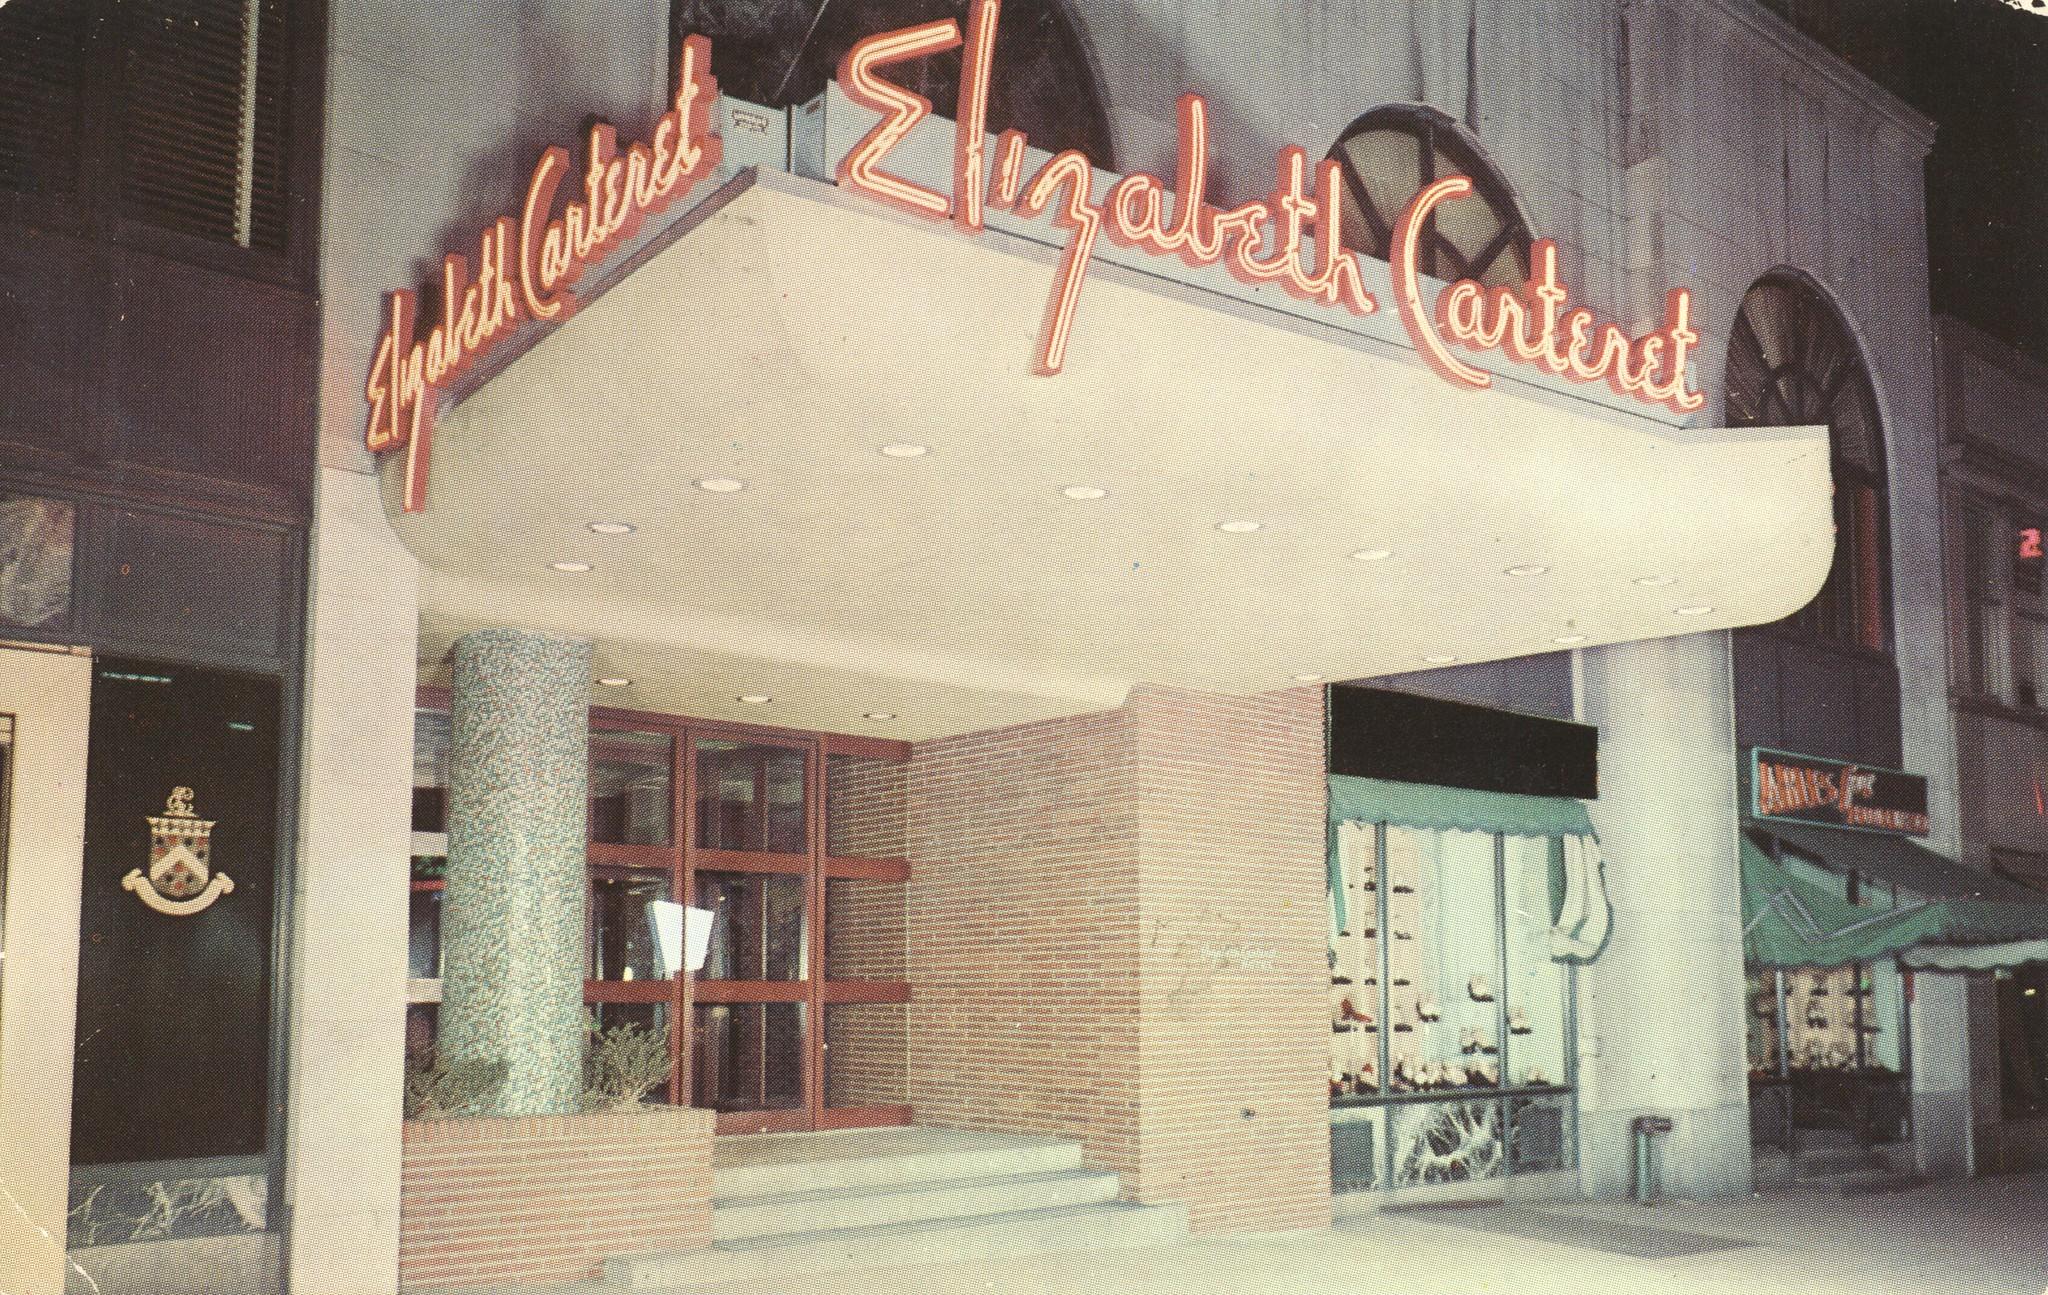 Elizabeth Carteret Hotel - Elizabeth, New Jersey